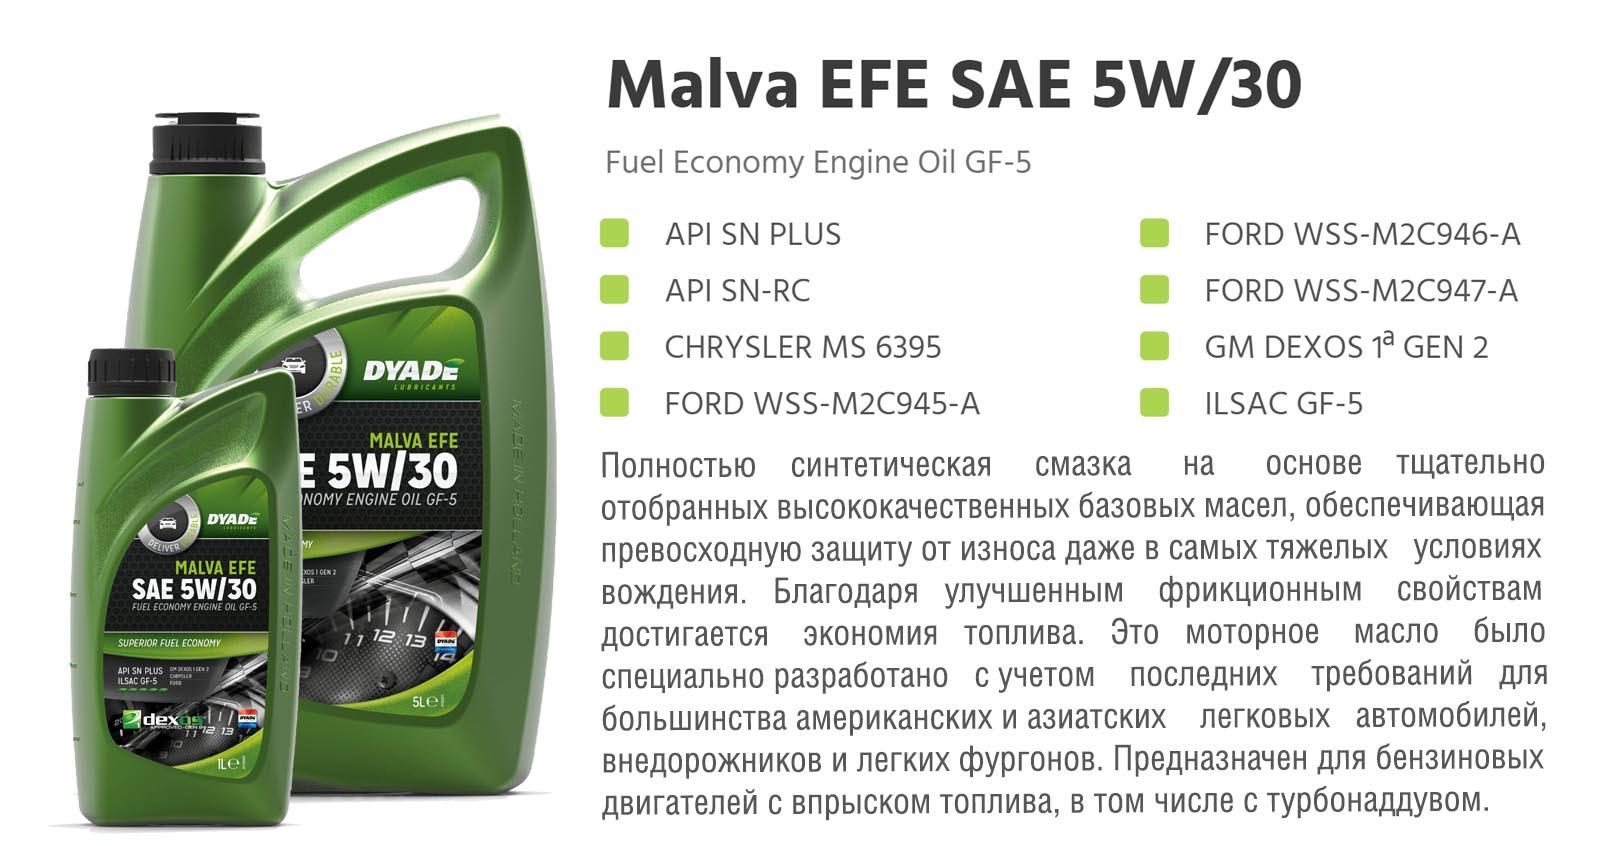 Масло моторное 8100 Eco-lite 5W30 4L 573849 dyadelubricants